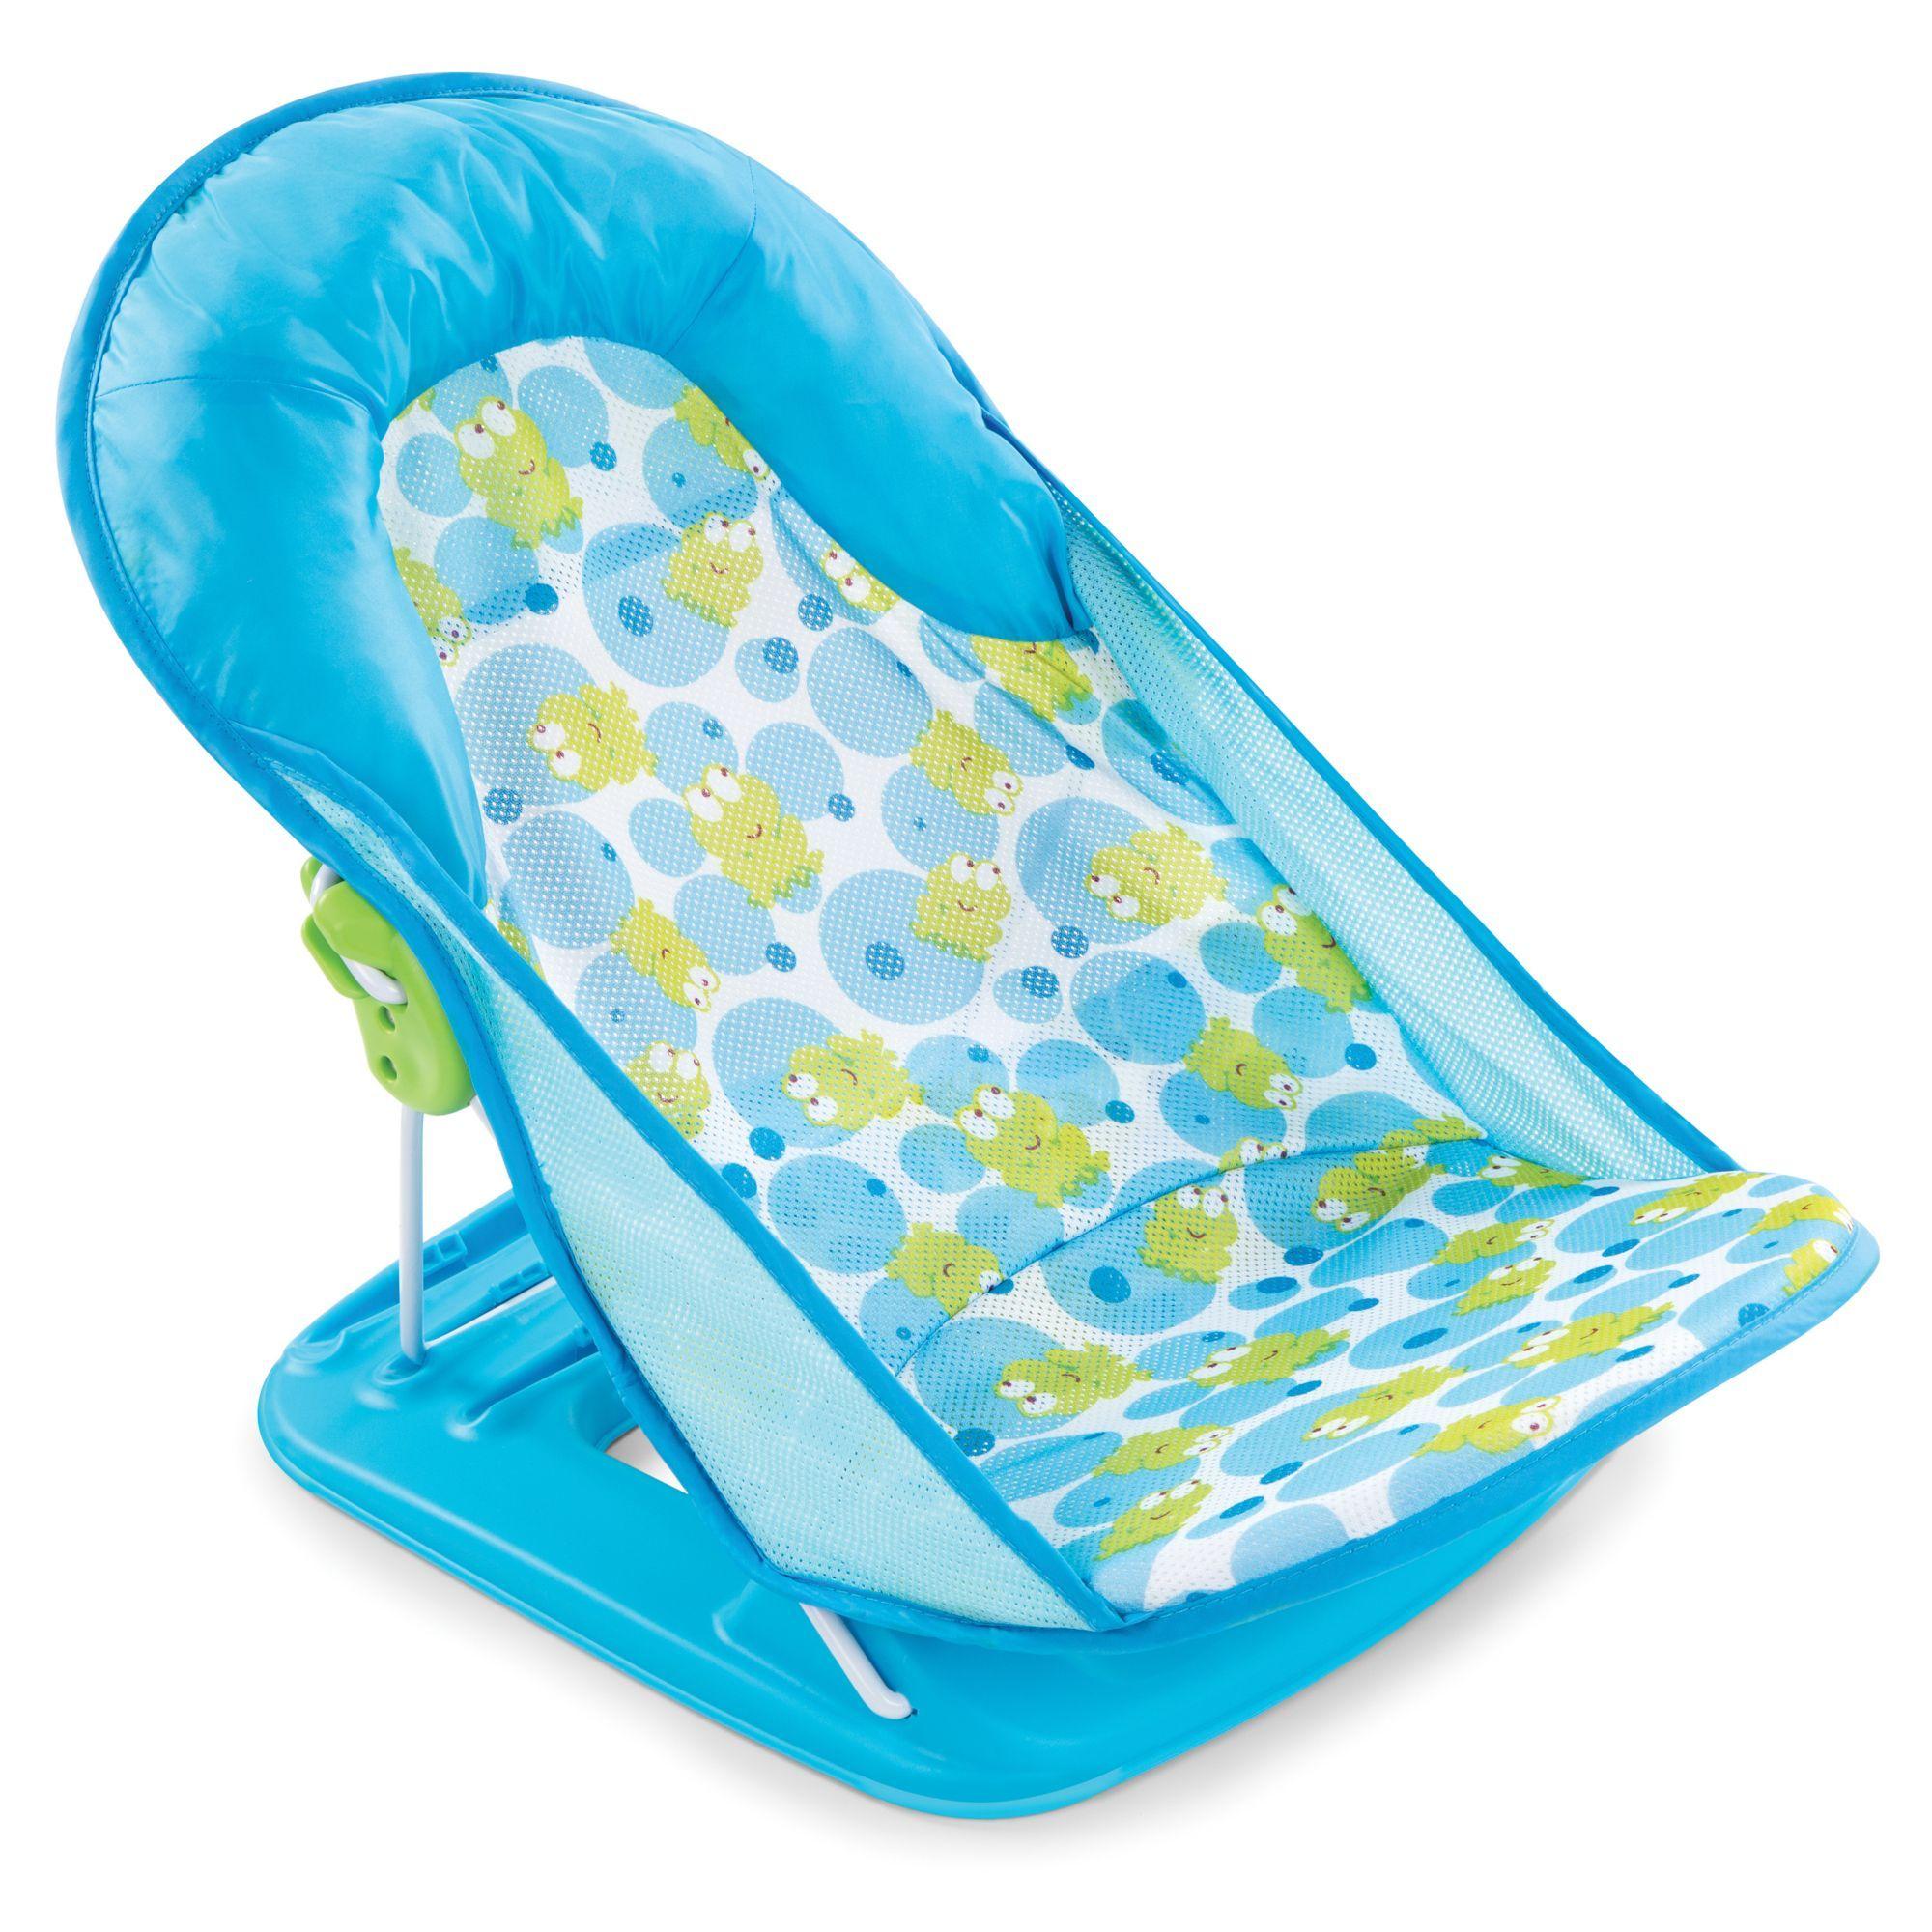 Summer Infant Deluxe Baby Bather Happy Frog | Baby bath